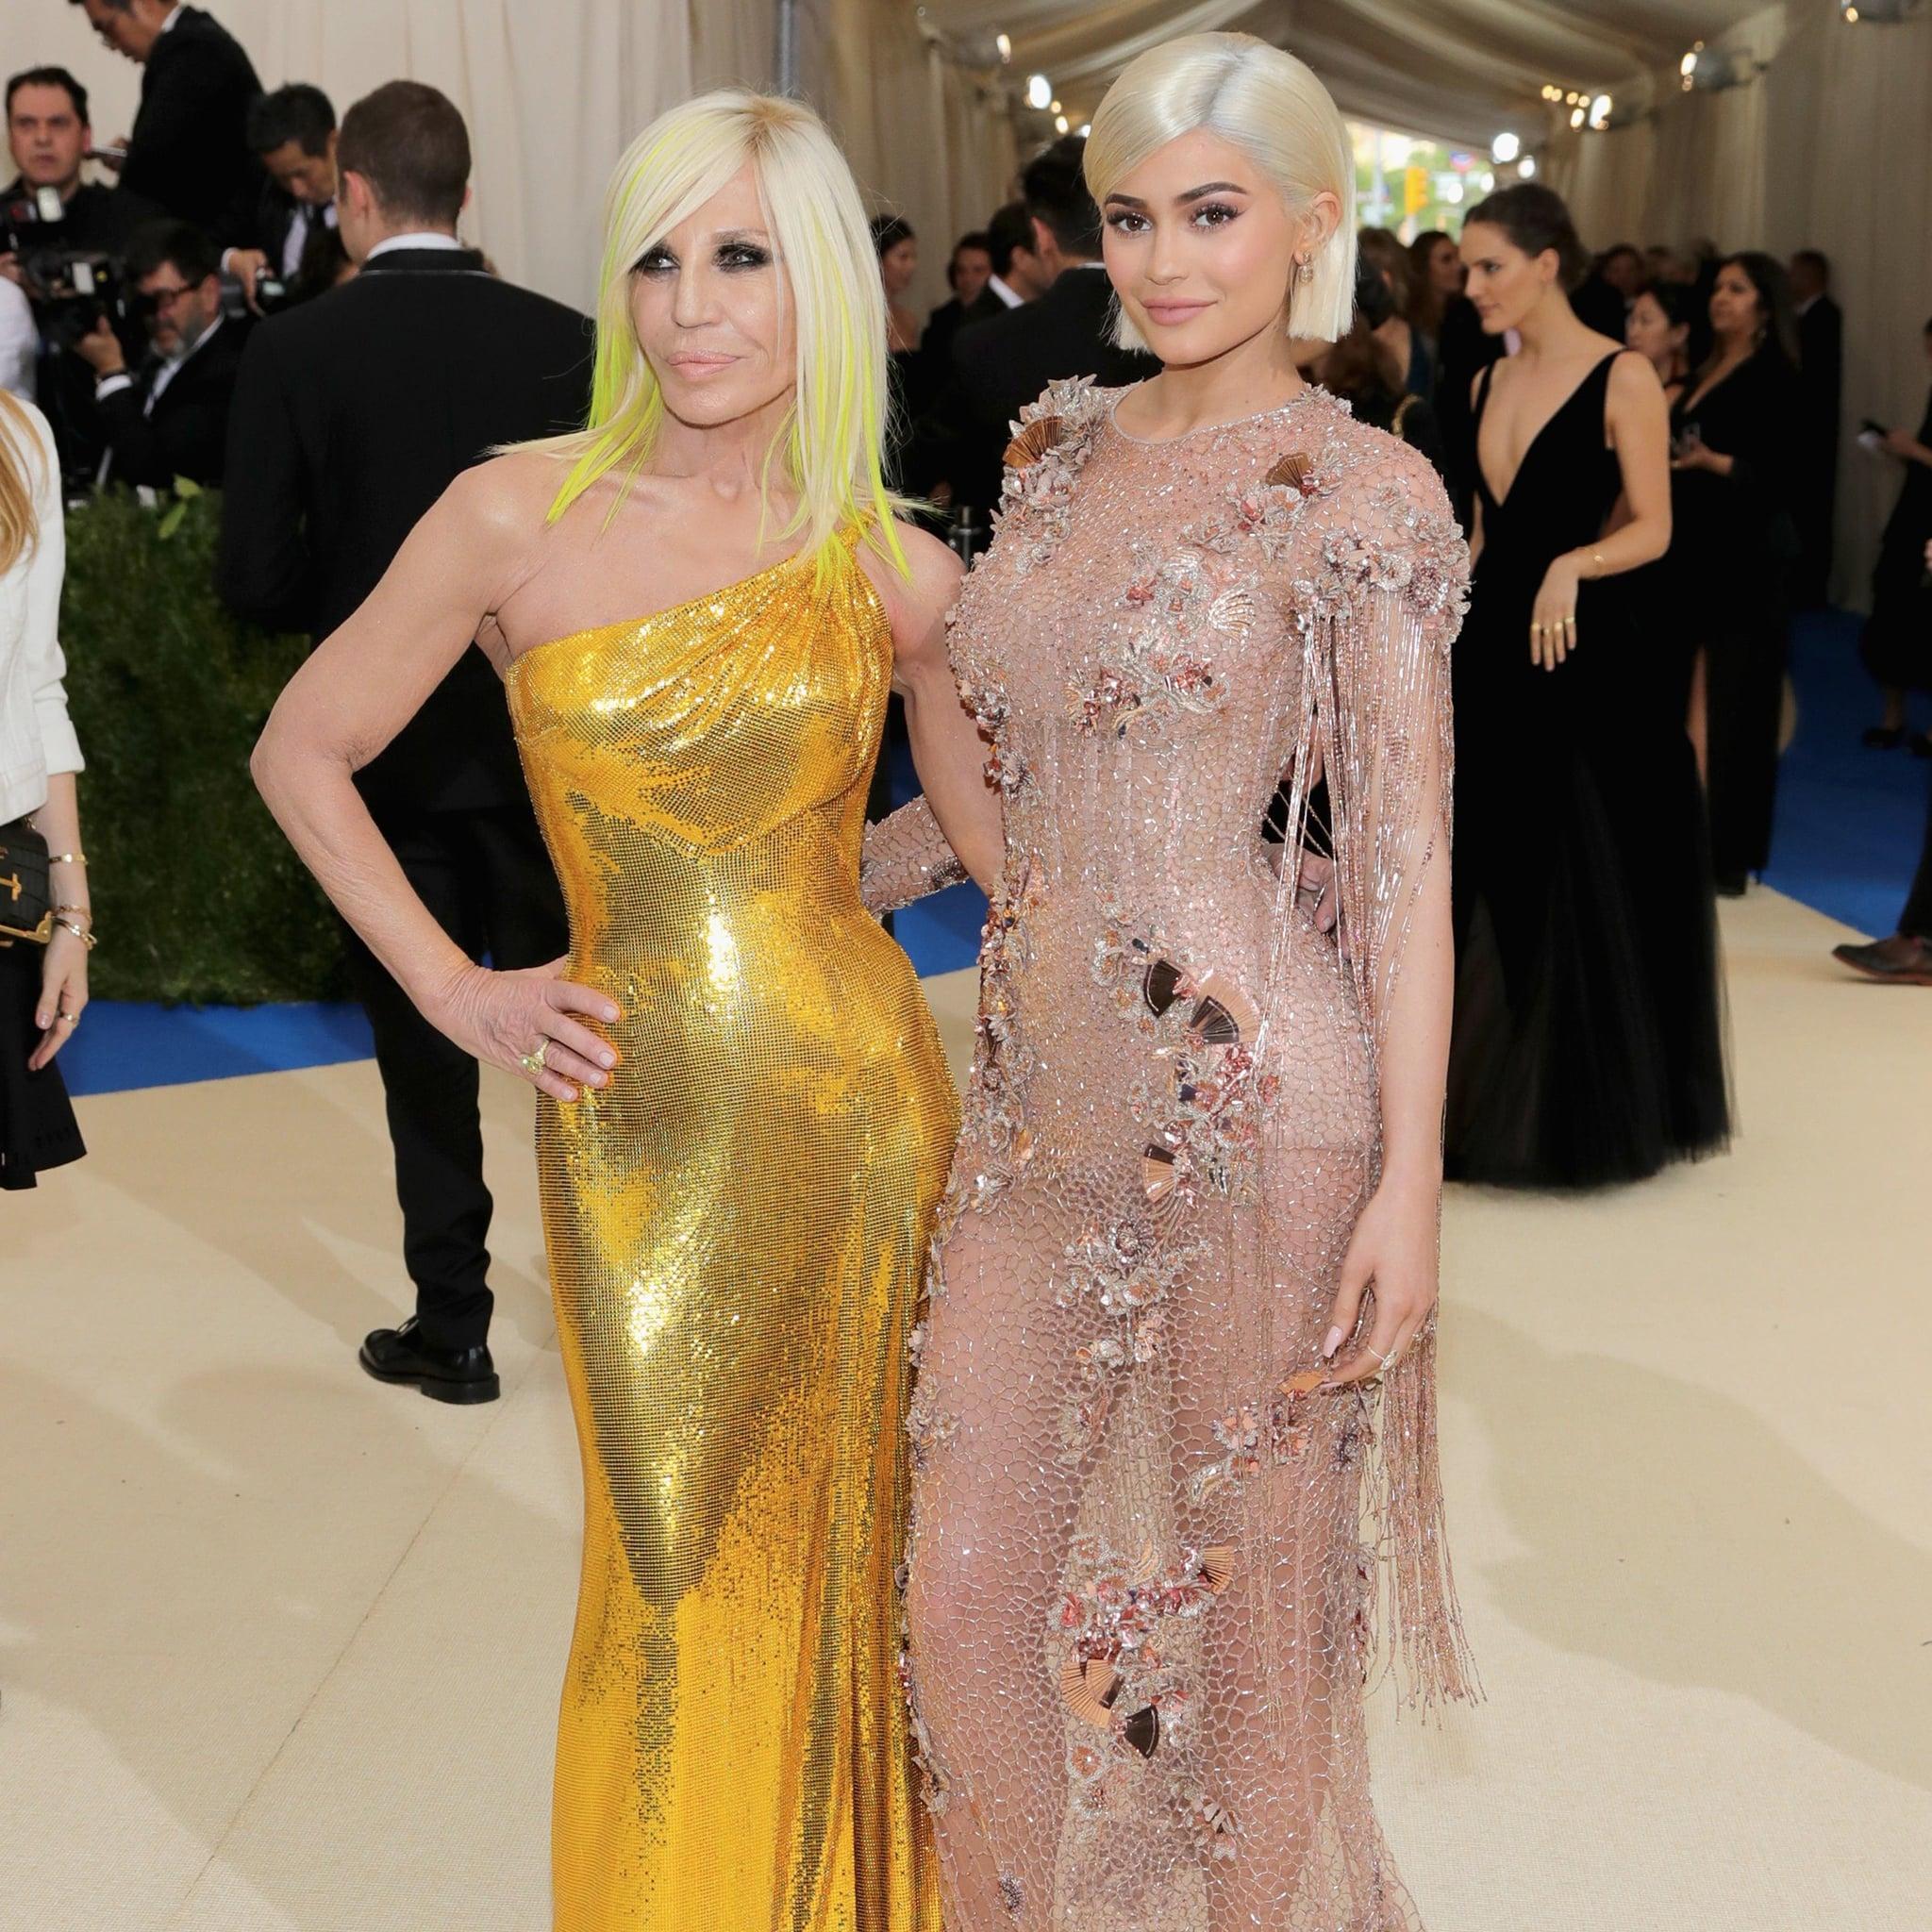 Donatella Versace | POPSUGAR UK